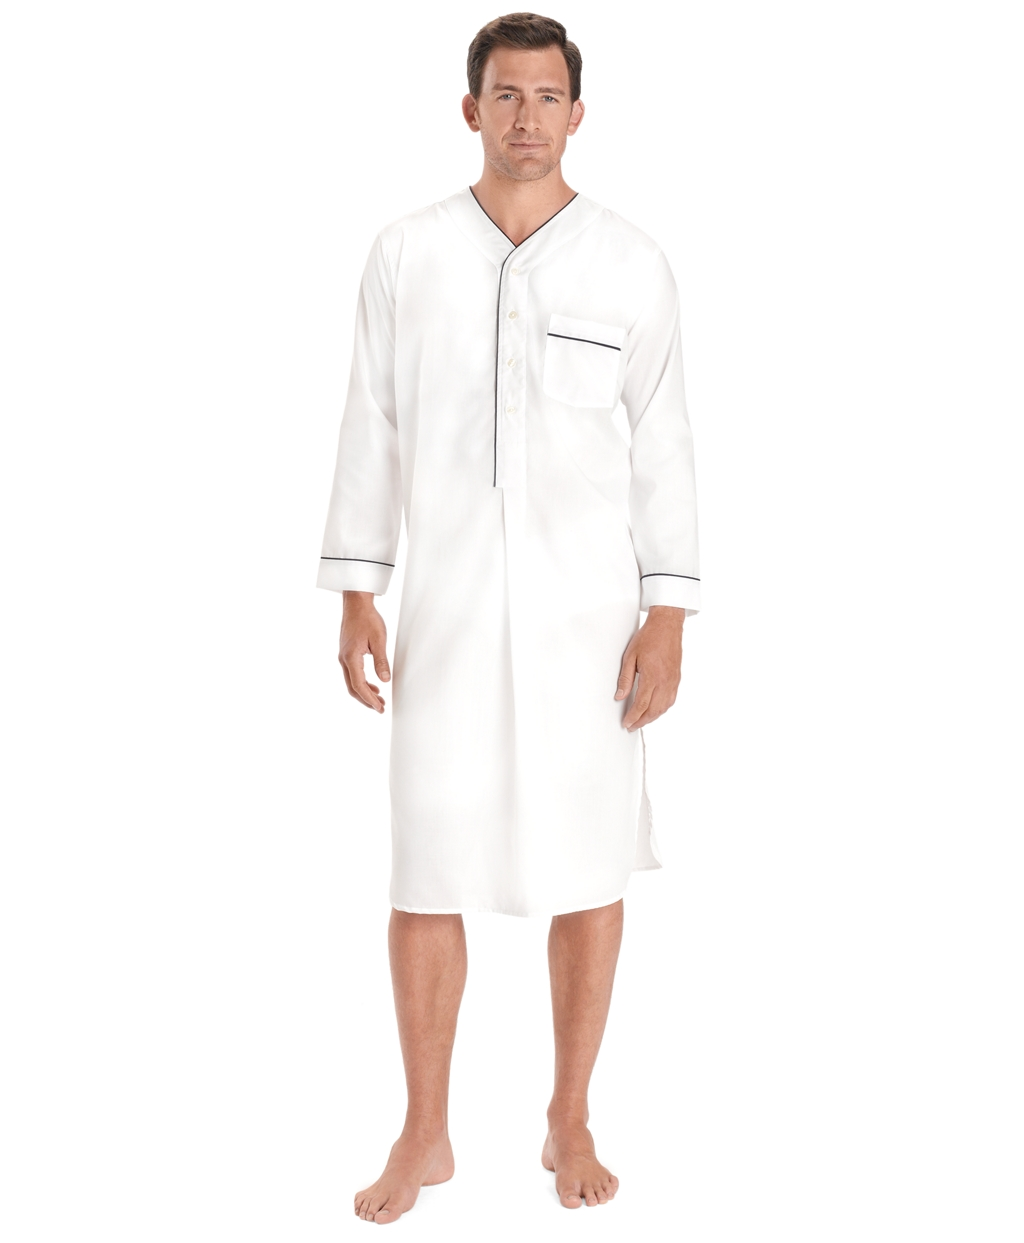 1940s Men's Underwear: Briefs, Boxers, Unions, & Socks Brooks Brothers Mens Wrinkle-Resistant Broadcloth Nightshirt $55.65 AT vintagedancer.com